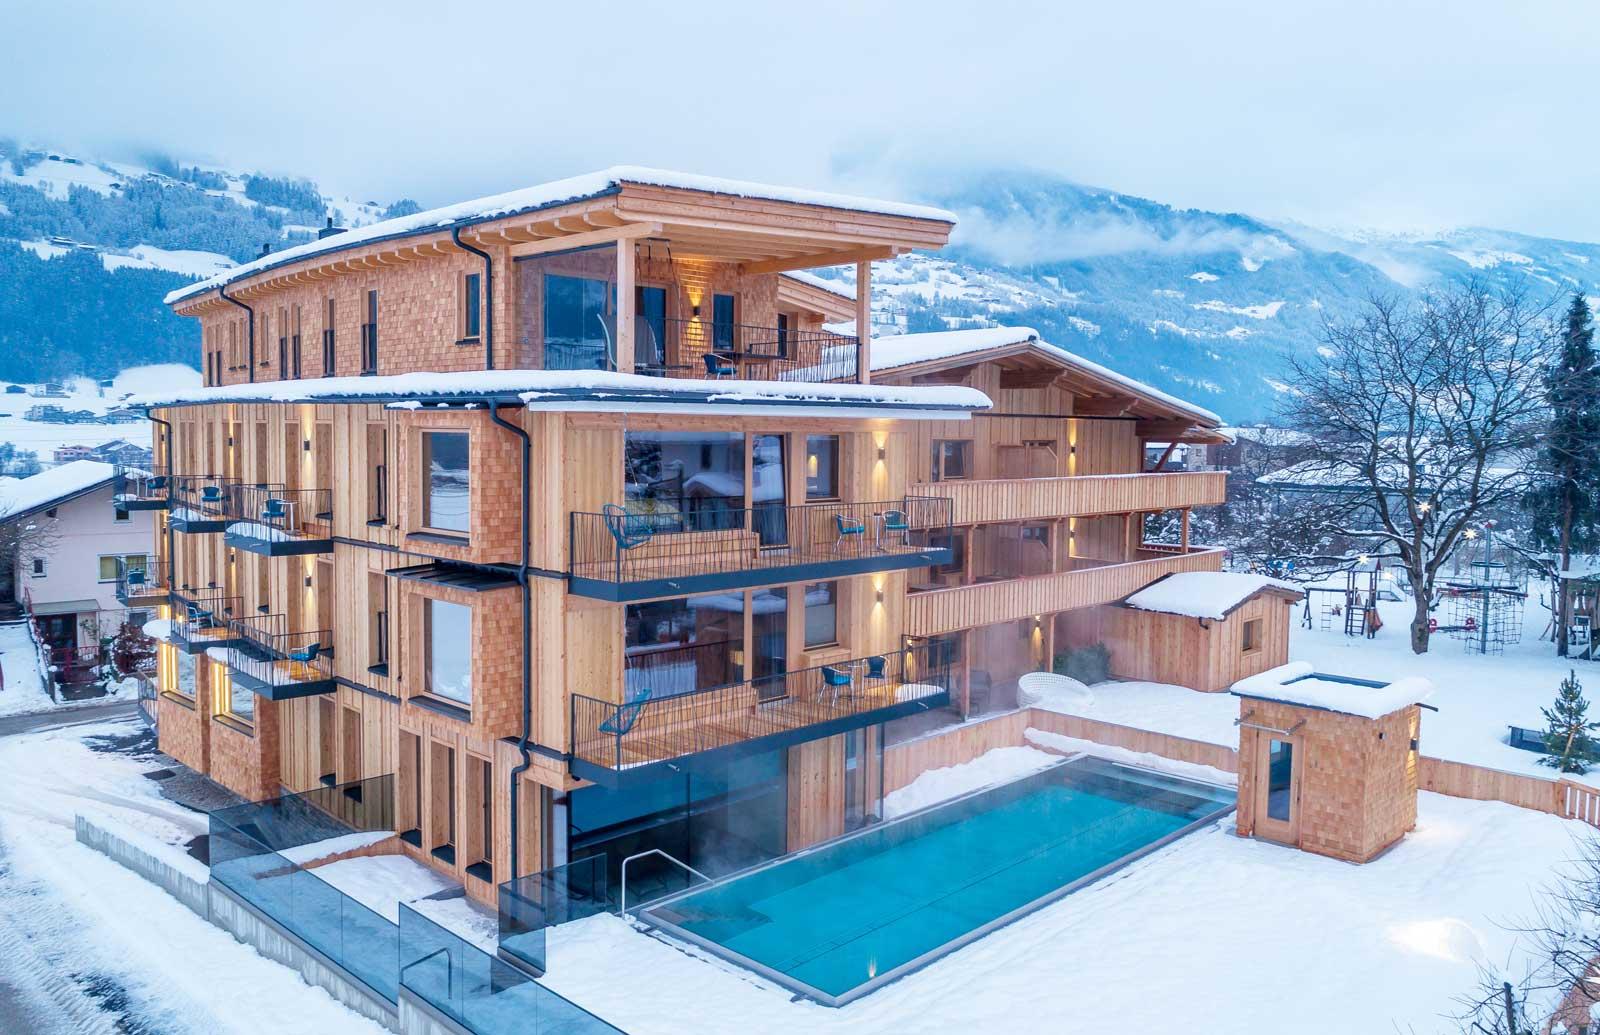 Апартаменты Циллерталь/ Appartement Zillertal